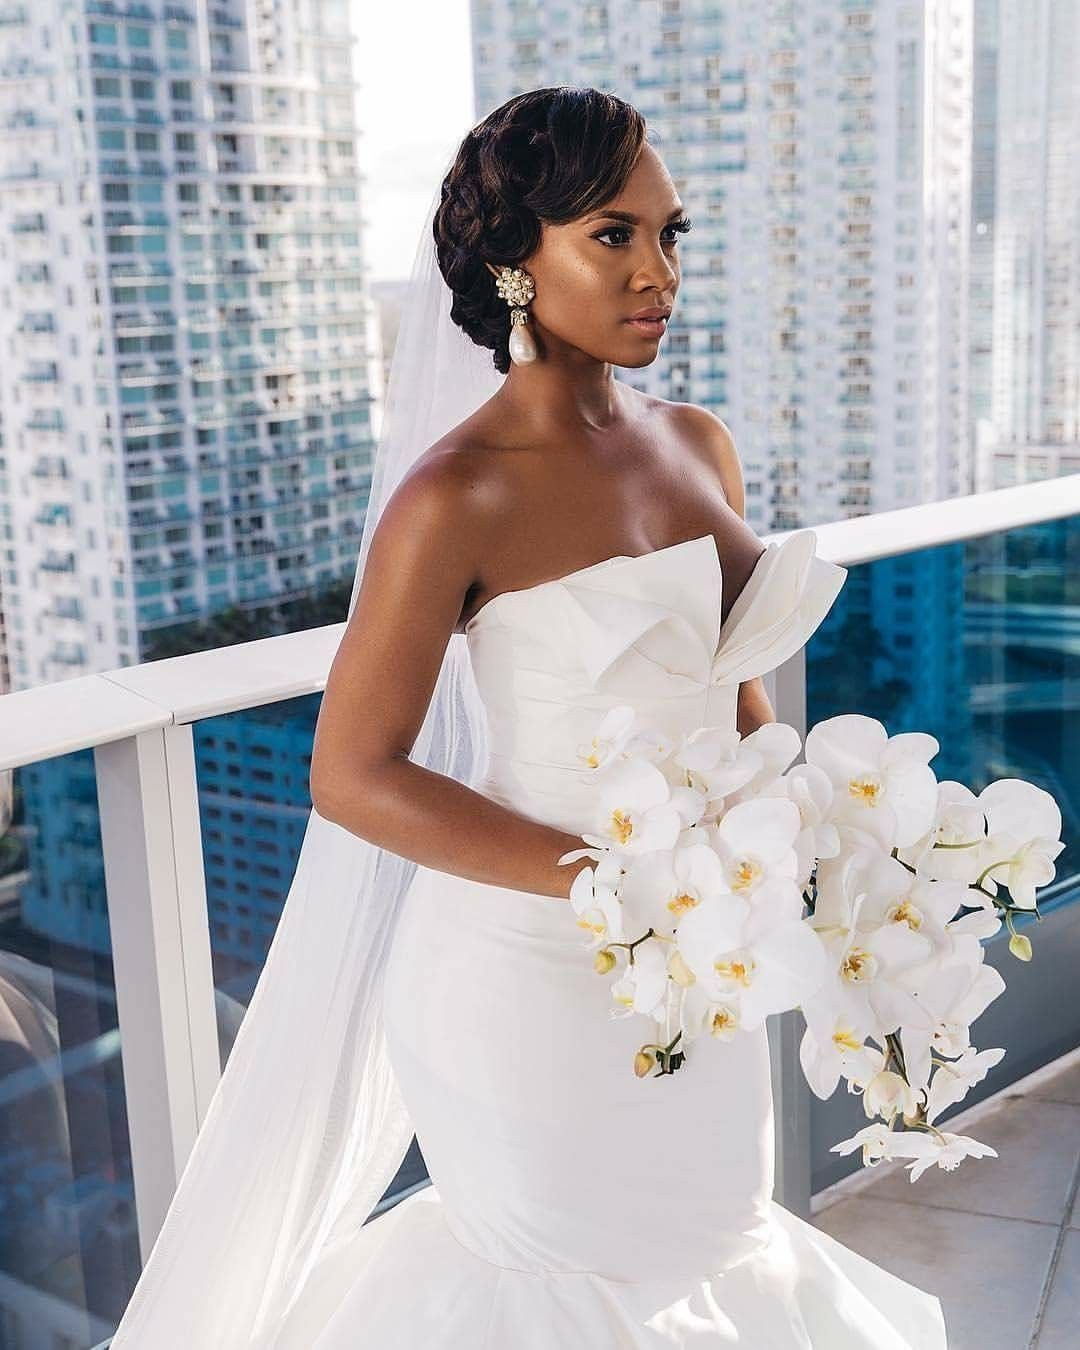 bridesbynona   wedding hairstyle?€   Pinterest   Spring hairstyles ...